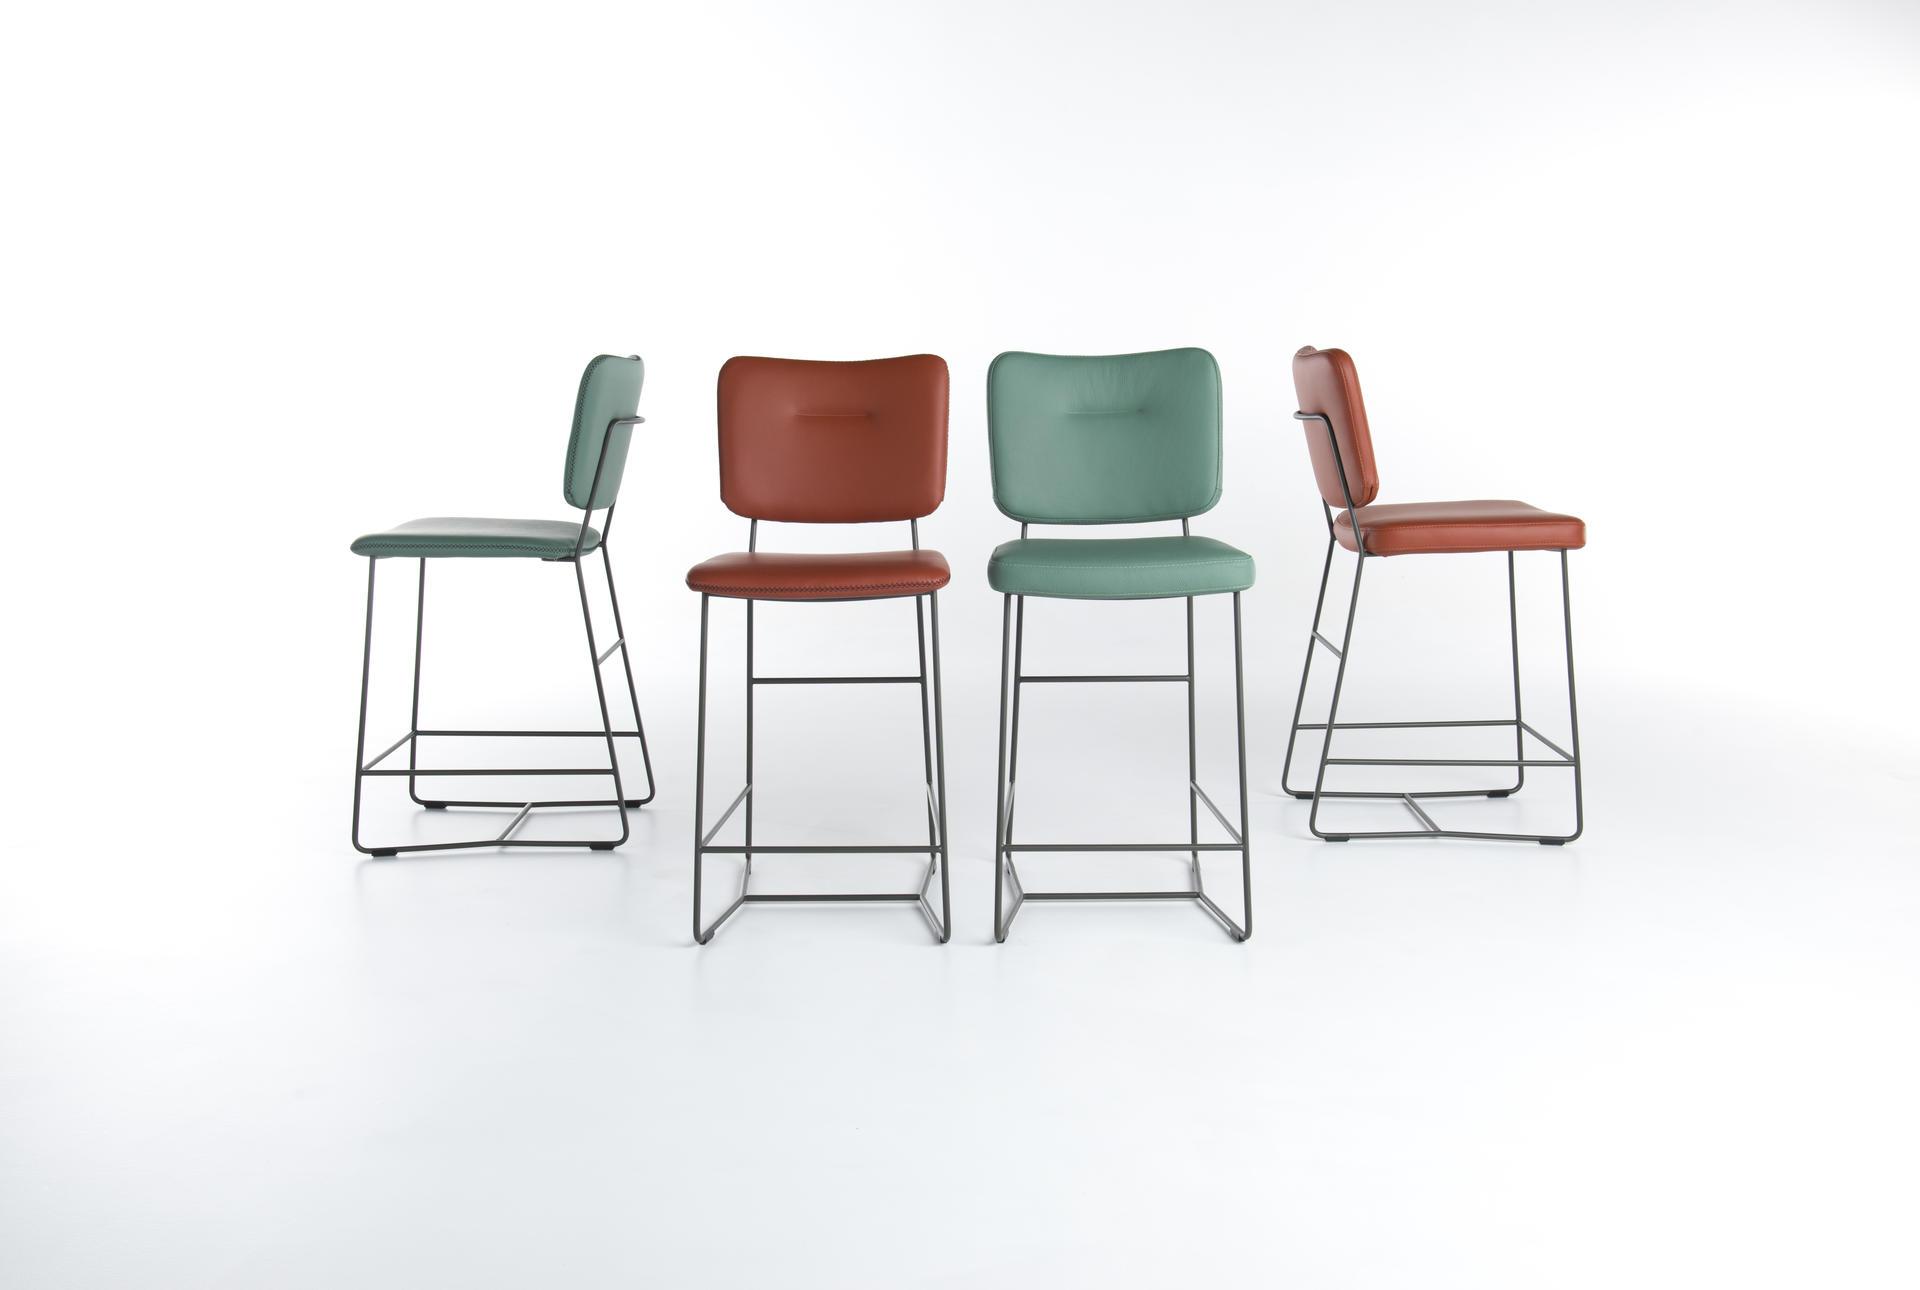 Барный стул стул Kiko, Bert Plantagie